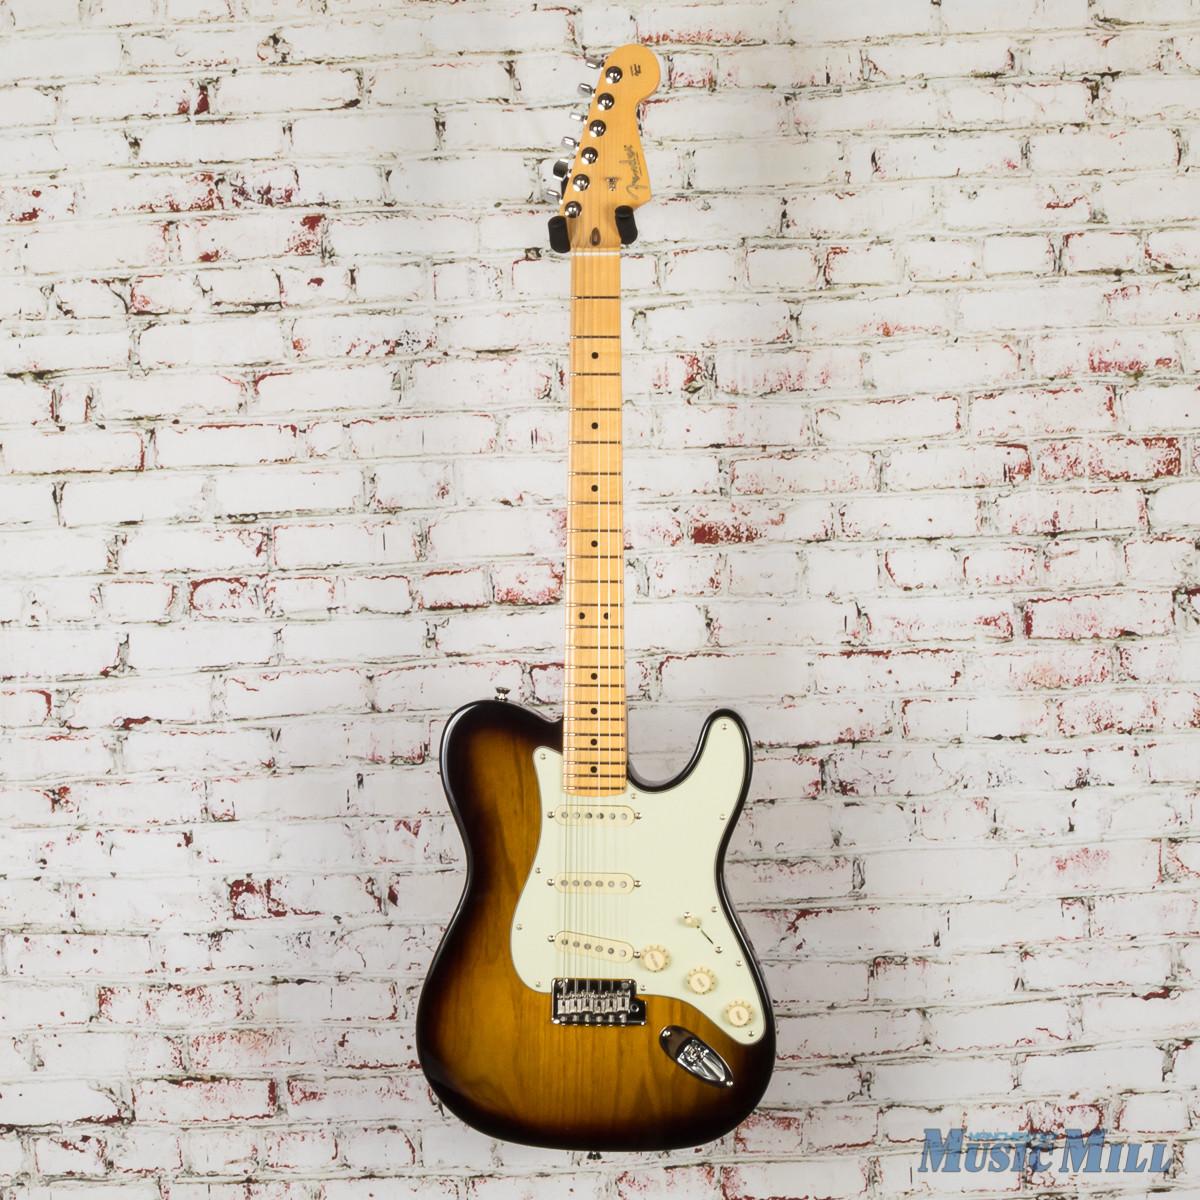 Fender Limited Edition Parallel Universe Strat-Tele Hybrid Electric Guitar 2-Tone Sunburst